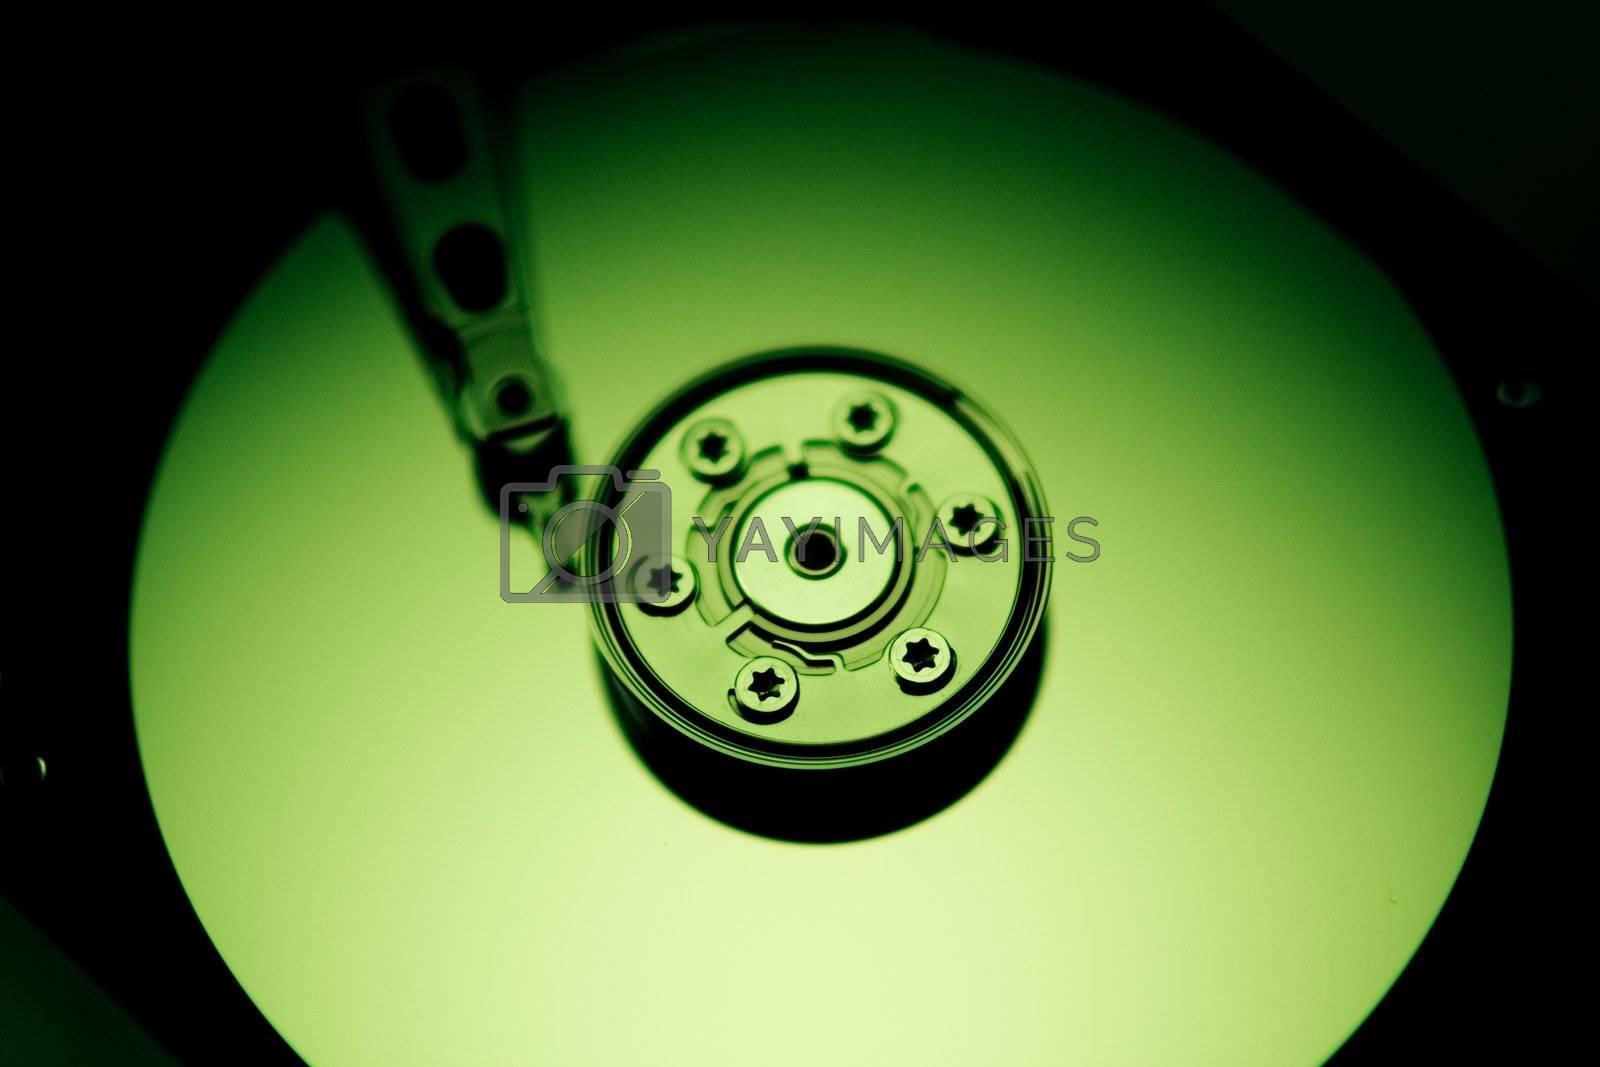 a green tinted hard drive